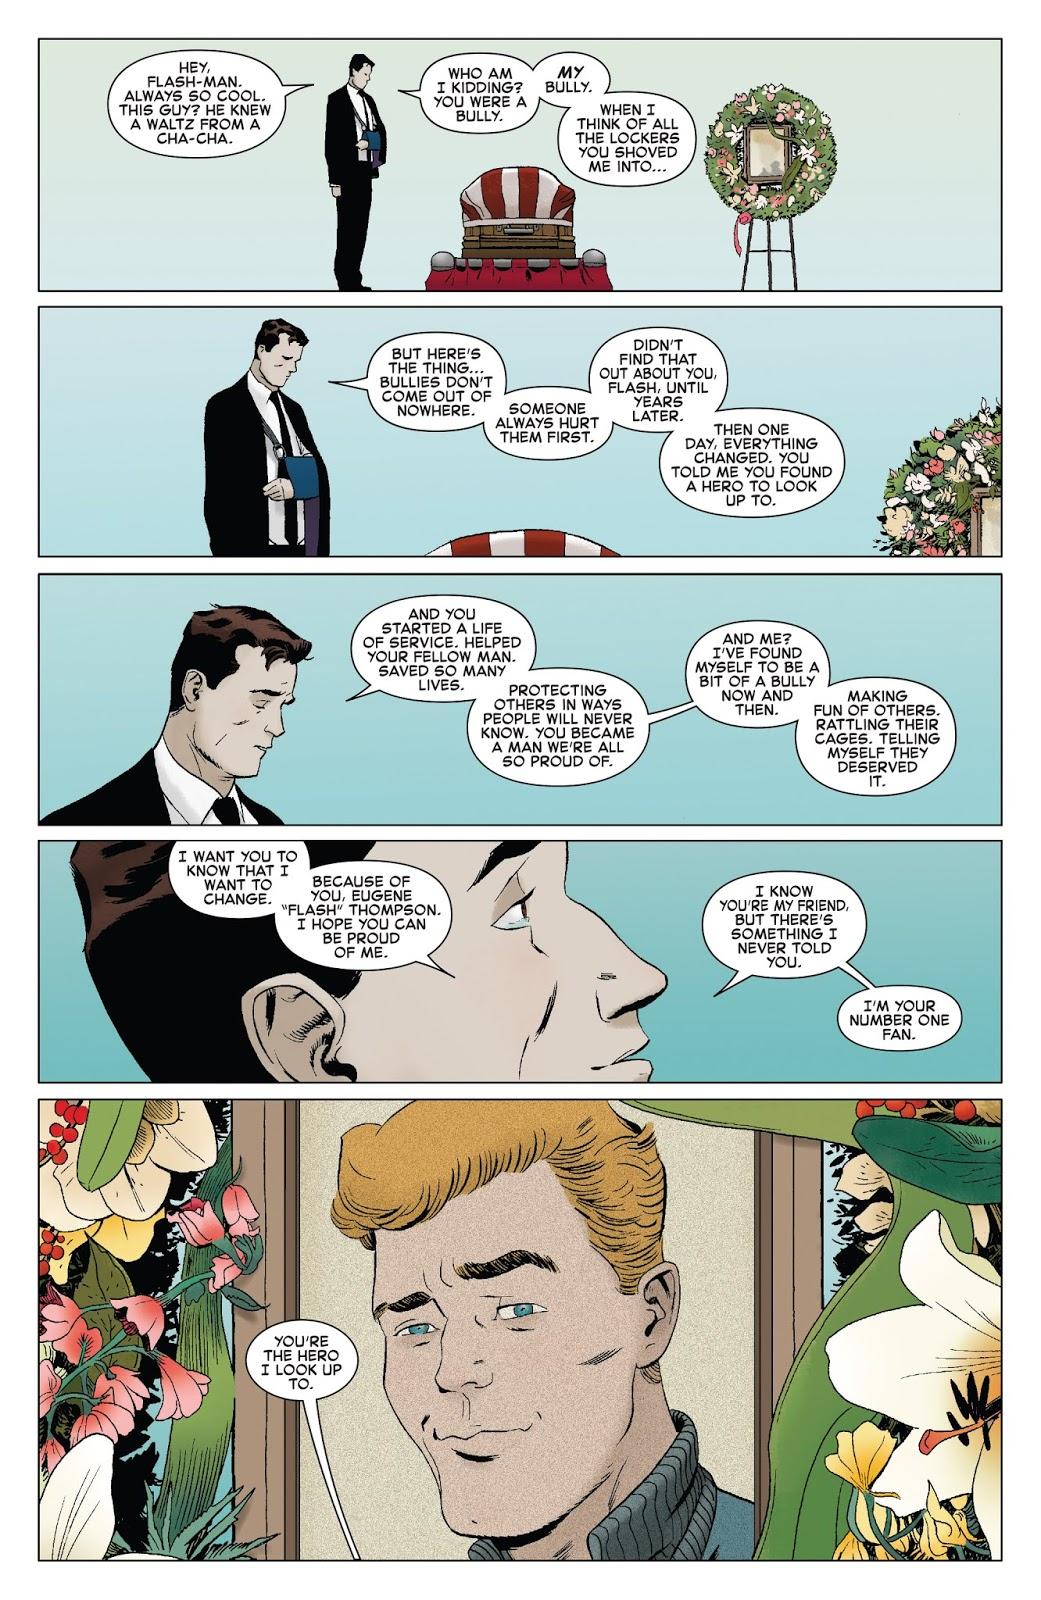 Flash Thompson's Funeral